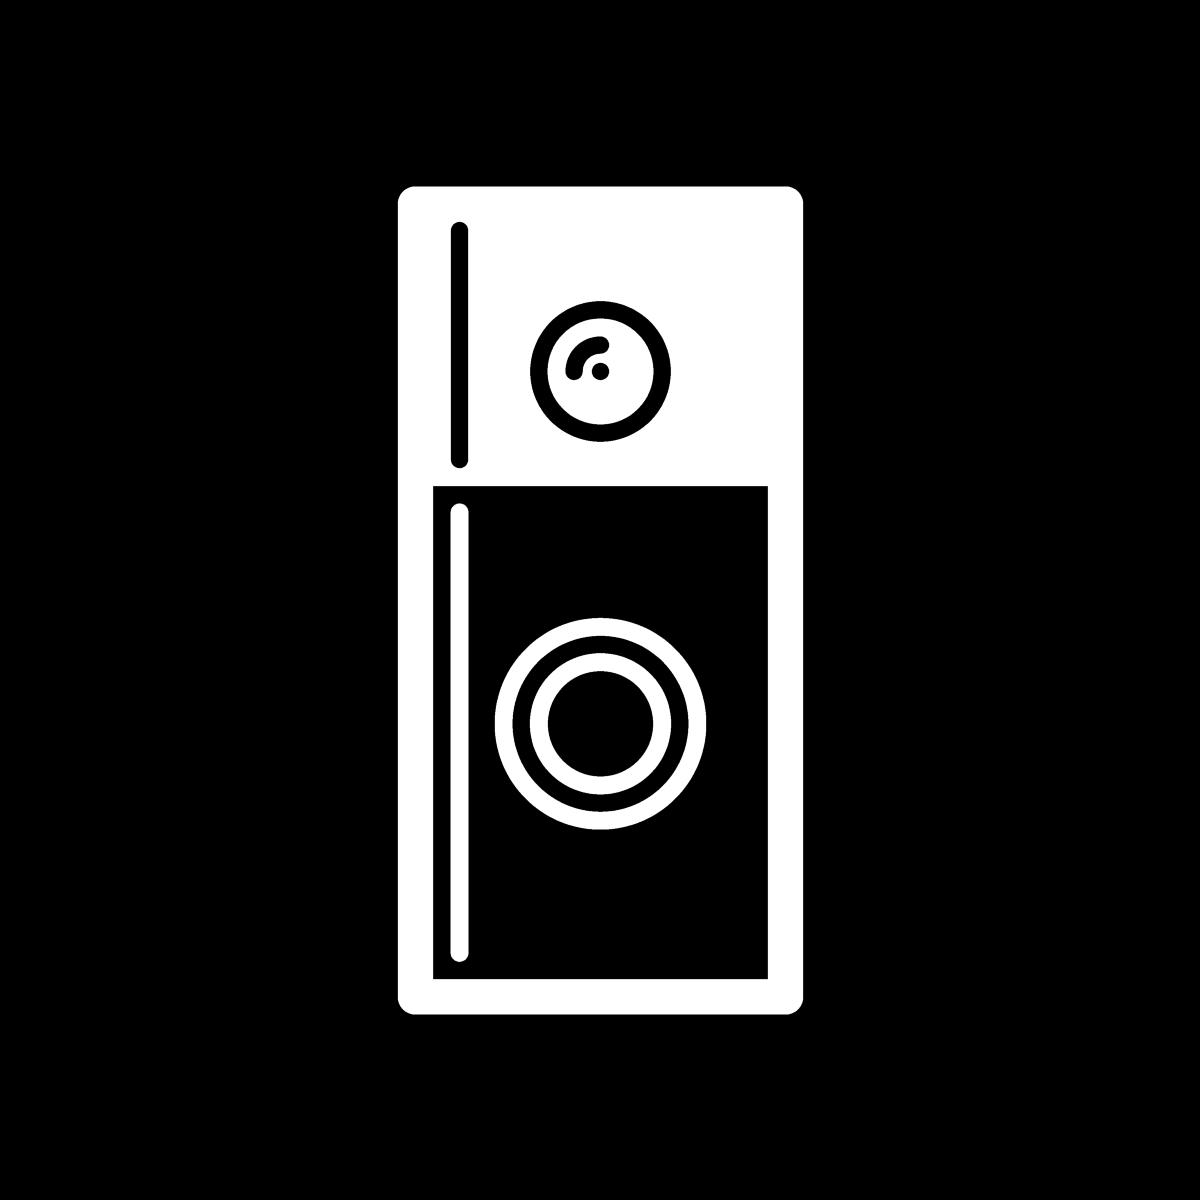 icon depicting CCTV doorbell